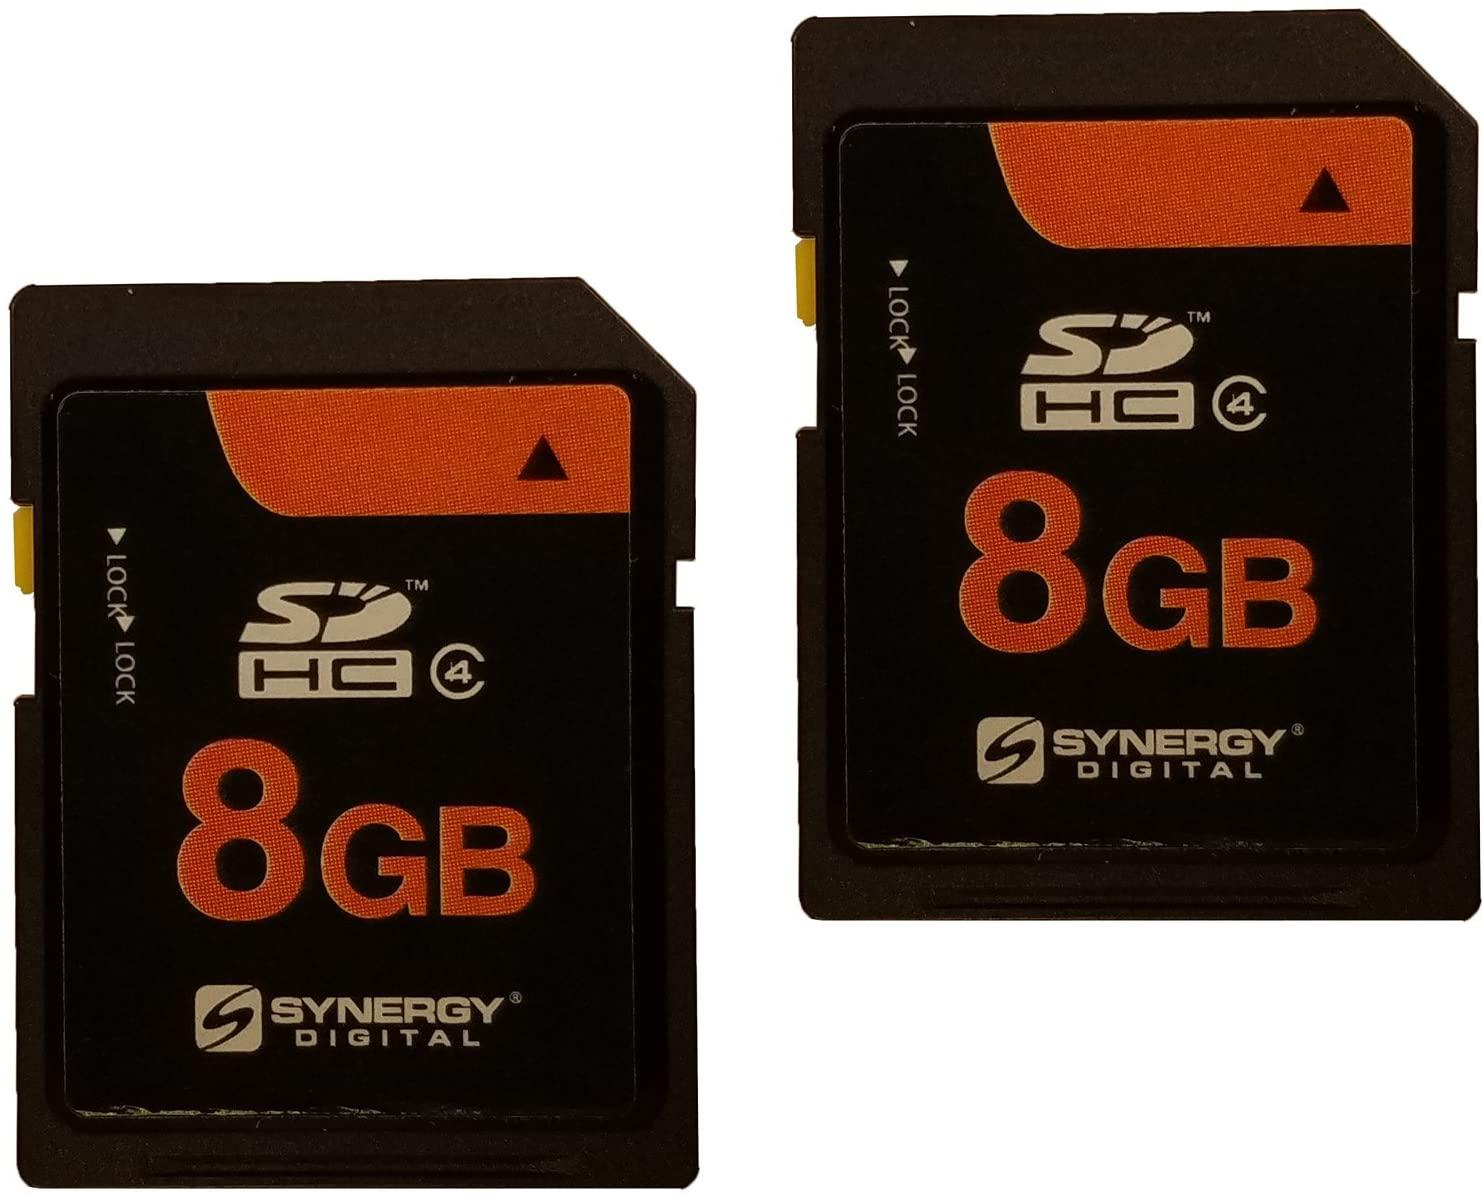 Konica KD-410Z Digital Camera Memory Card 2 x 8GB Secure Digital High Capacity (SDHC) Memory Cards (2 Pack)